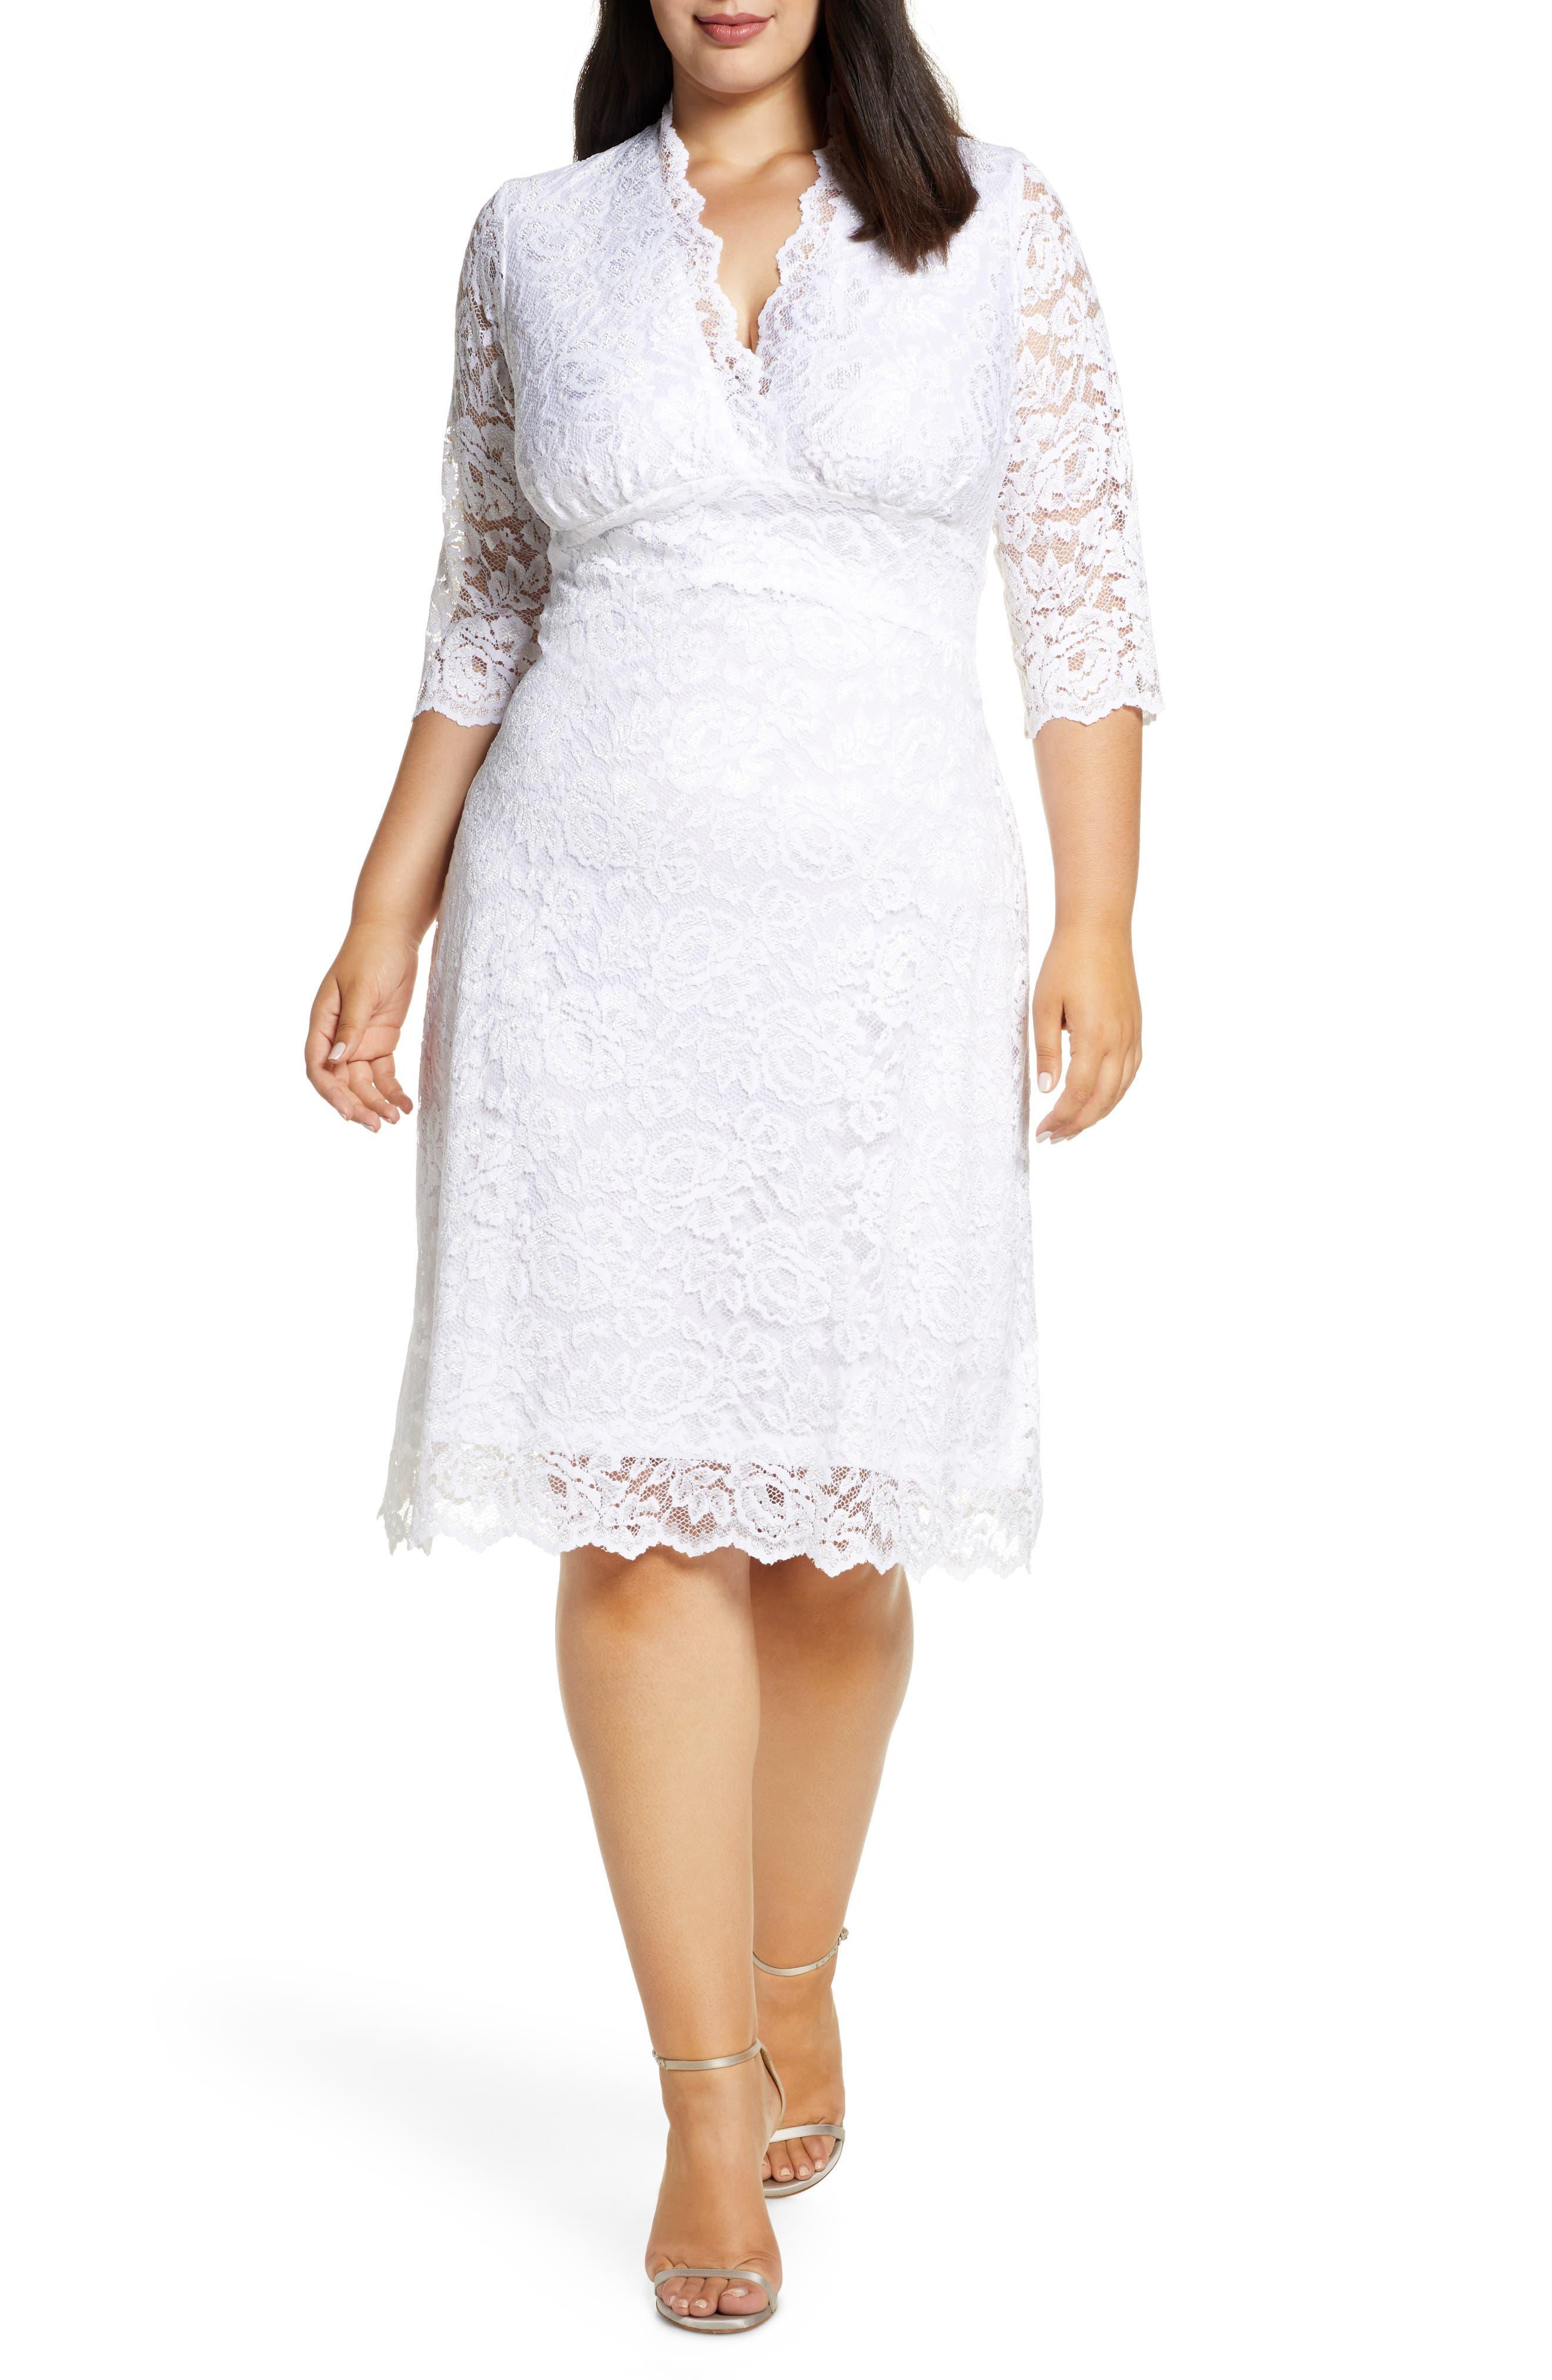 50s Wedding Dress, 1950s Style Wedding Dresses, Rockabilly Weddings Plus Size Womens Kiyonna Lace Cocktail Dress $218.00 AT vintagedancer.com